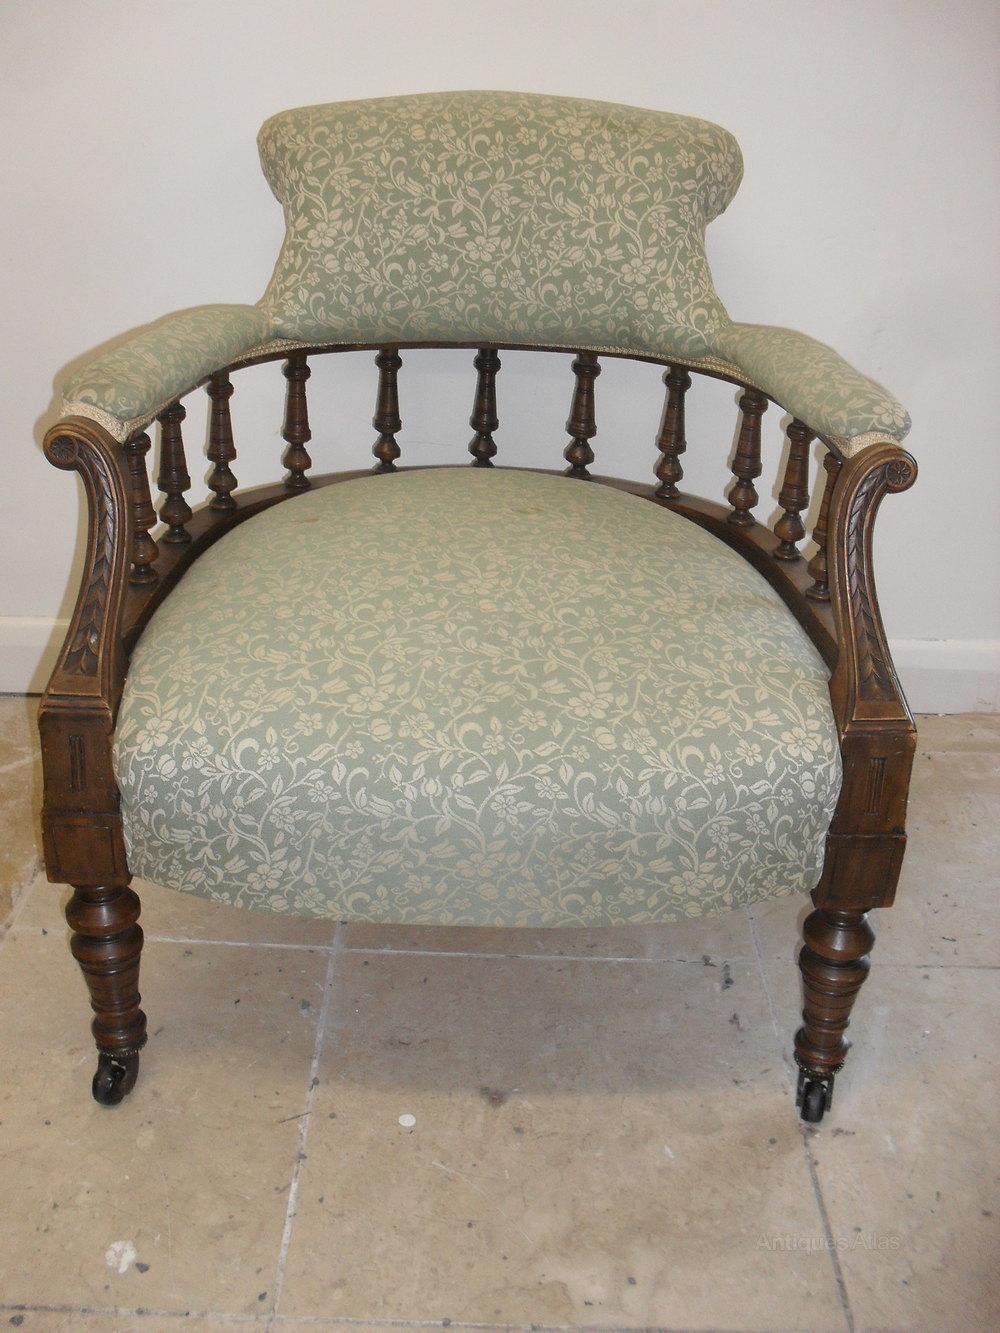 Victorian Walnut Tub Chair - Antiques Atlas